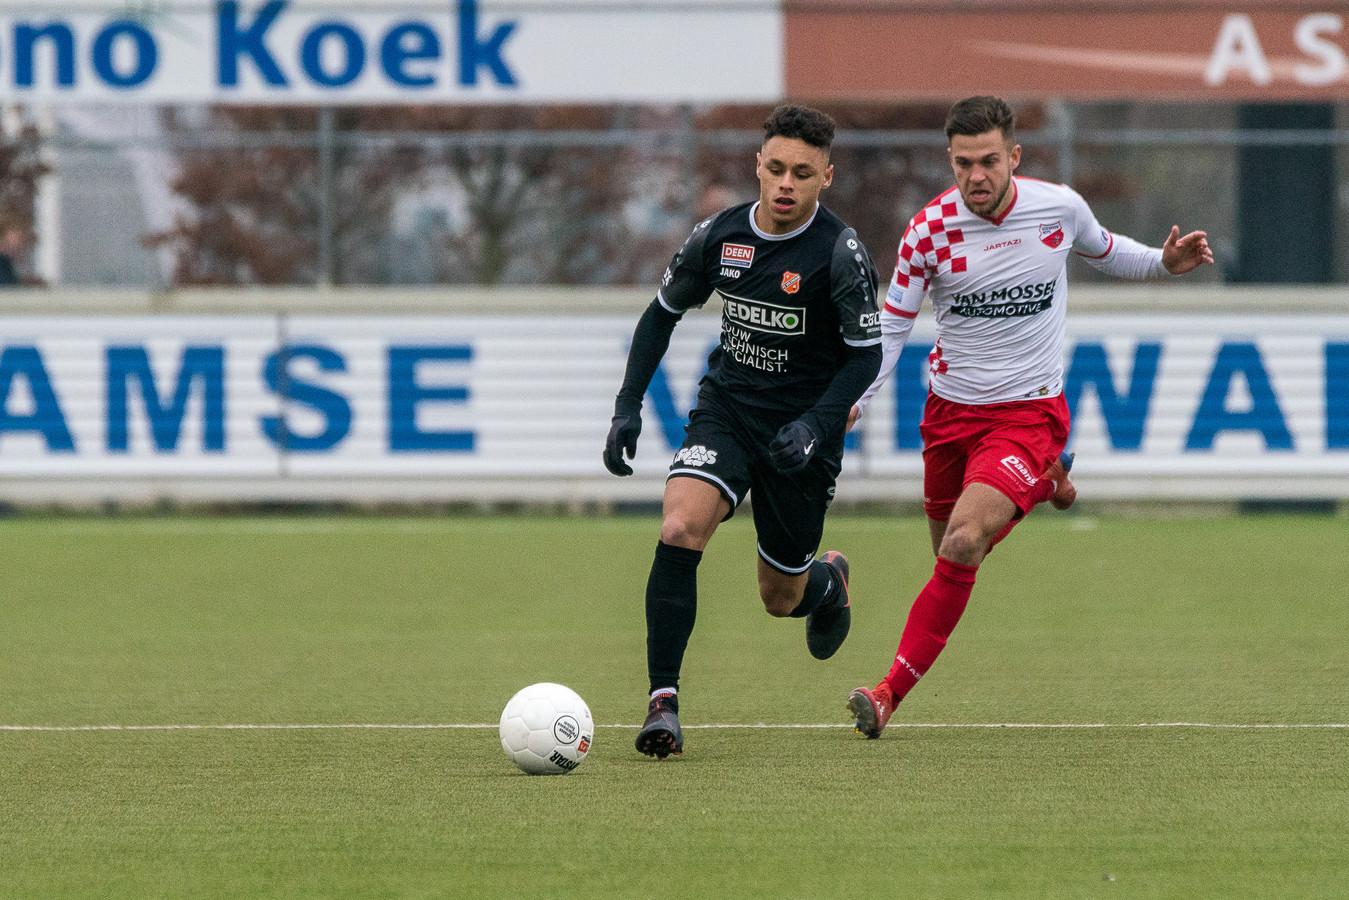 25-01-2020: Voetbal: Kozakken Boys v Jong Volendam: Werkendam 2e divisie Amateurs 20192020 L-R Dean James van Jong Volendam, Mark Veenhoven van Kozakken Boys